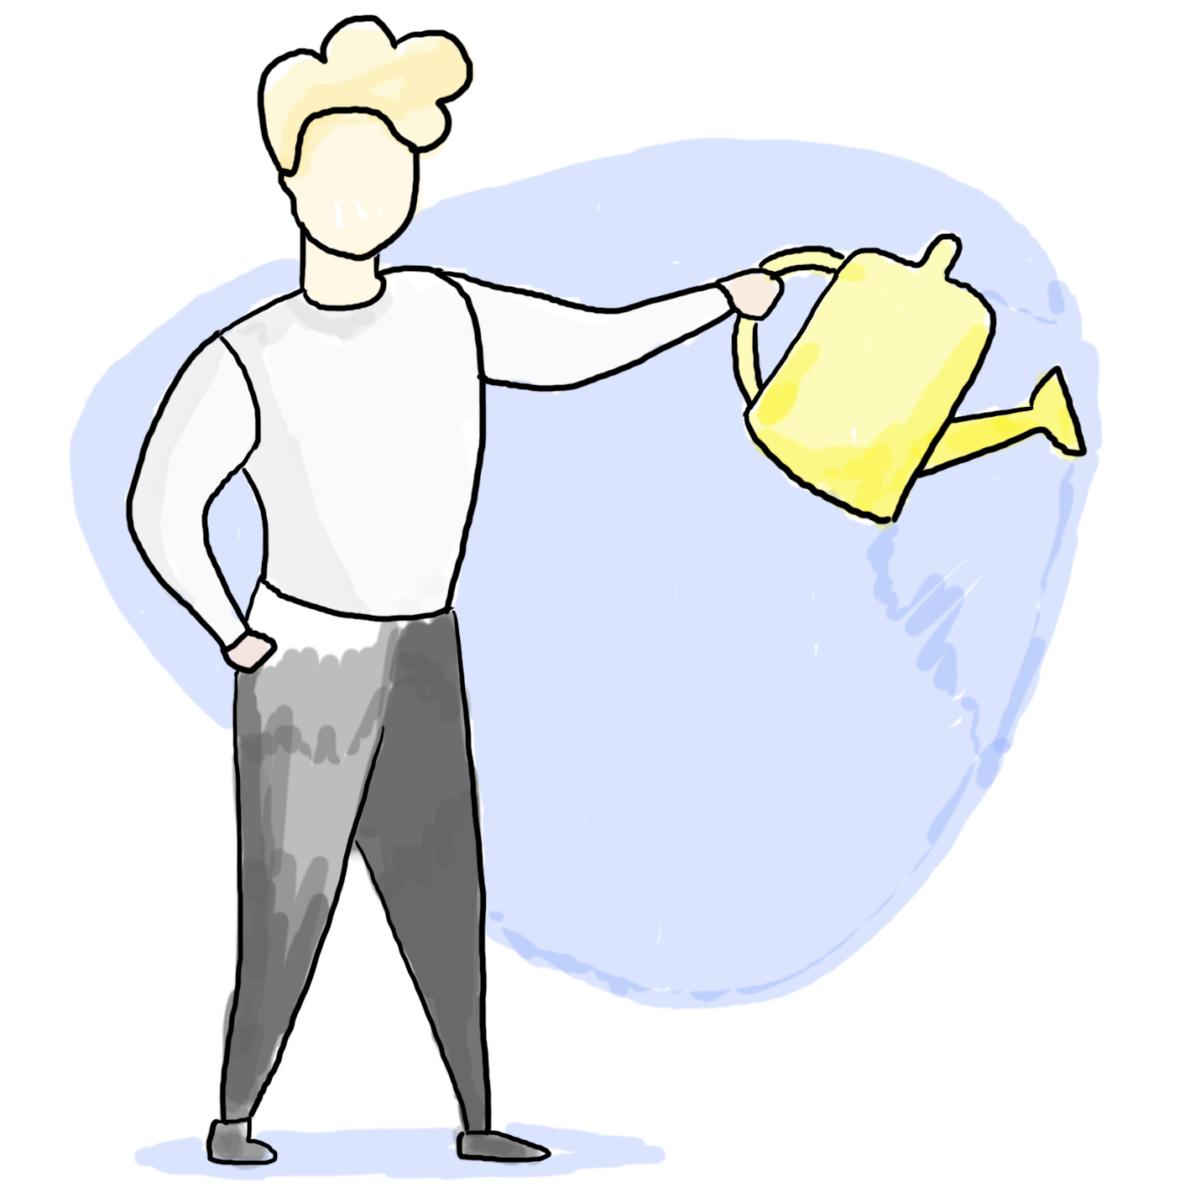 moving company nurturing leads